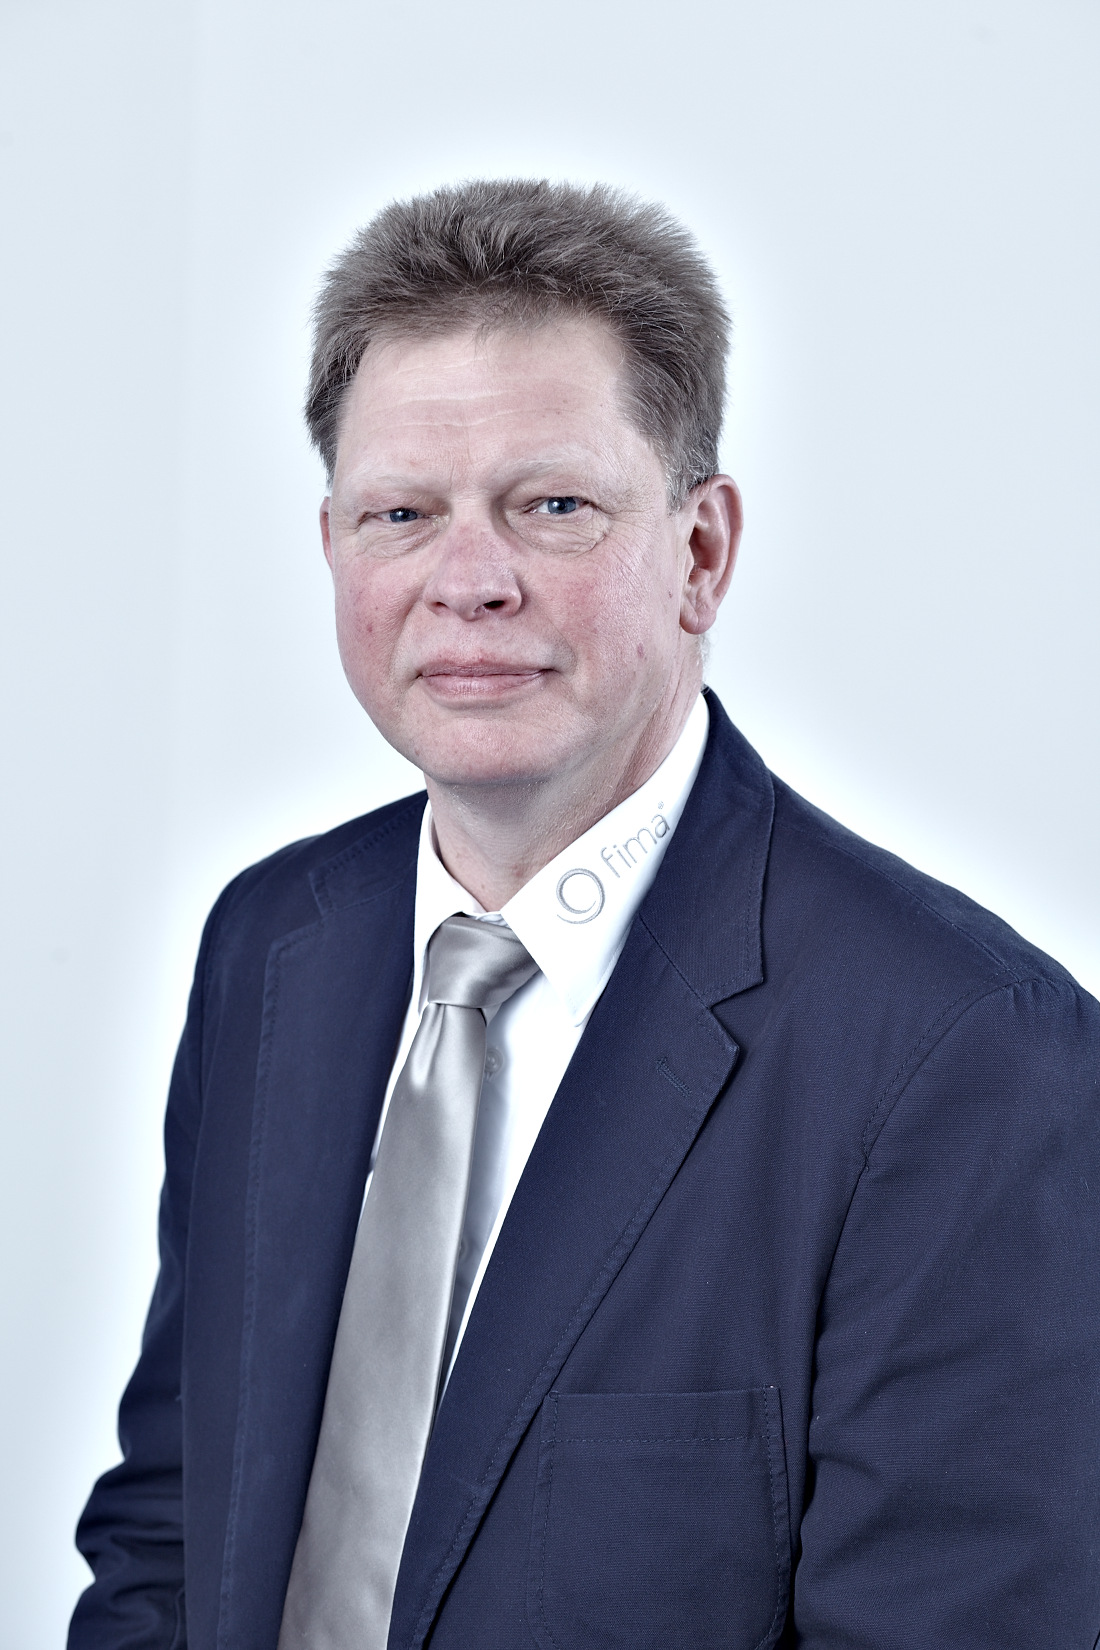 Manfred Kolleck, Vertriebsingenieur, Fima Maschinenbau